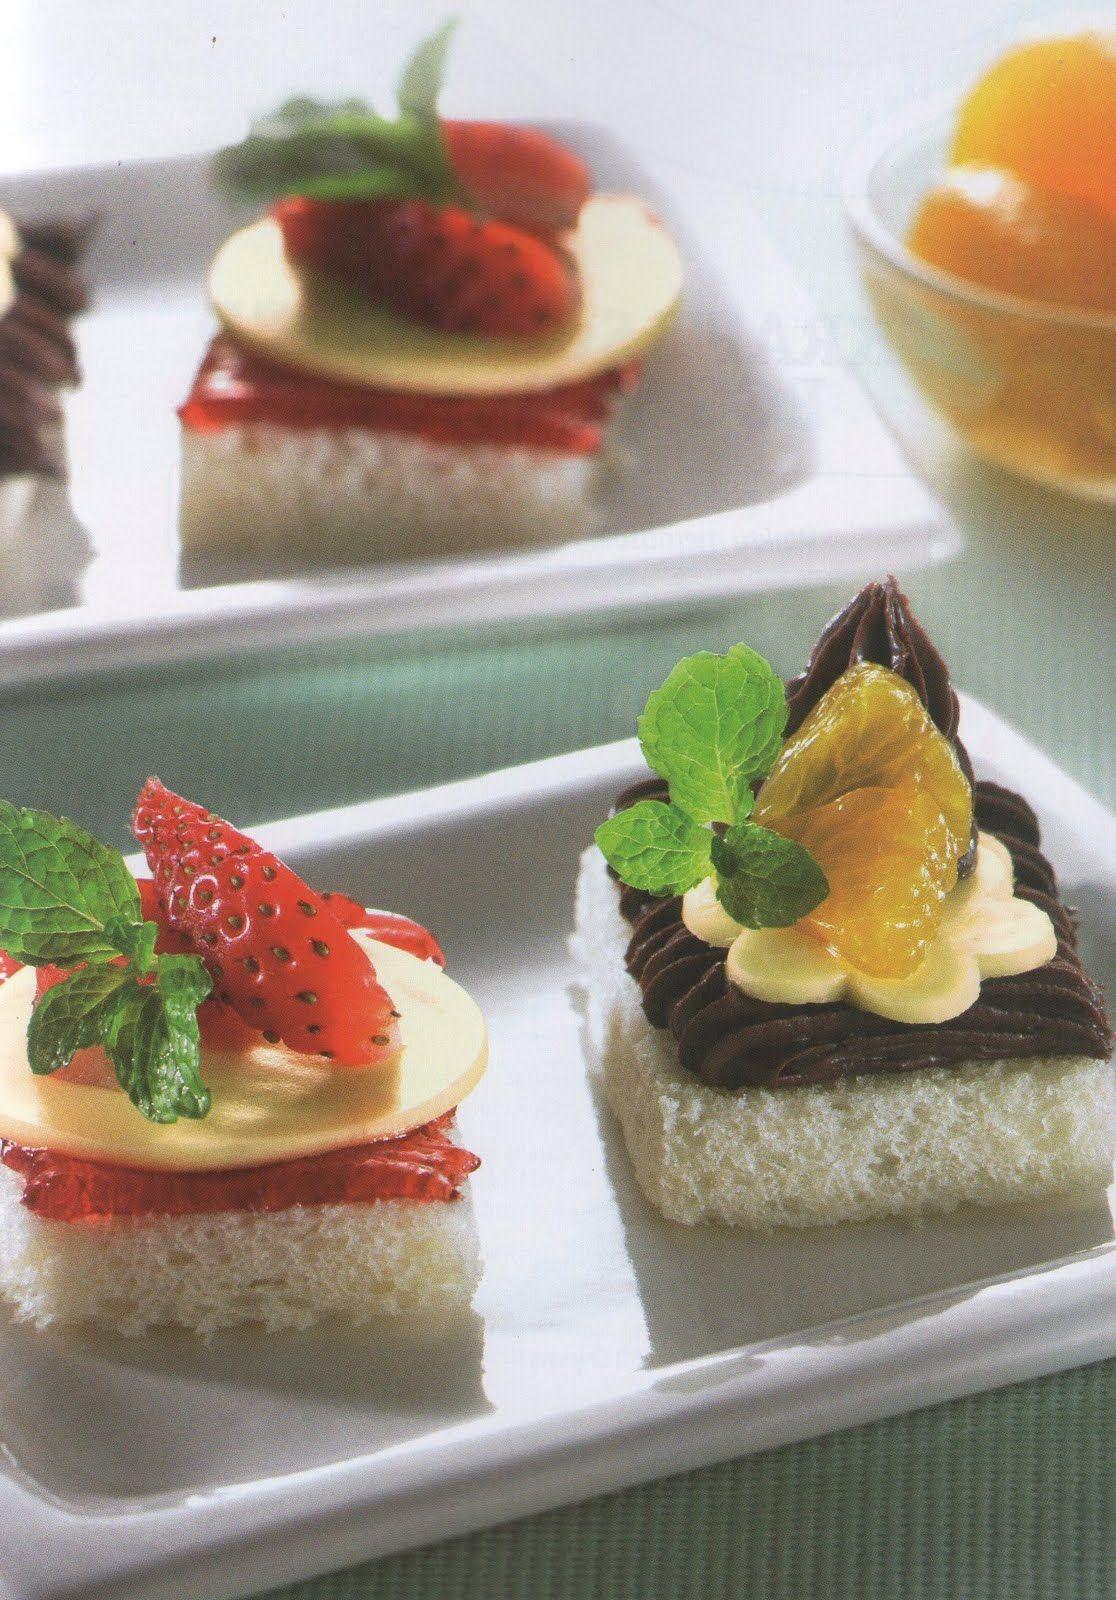 Roti Canape Topping Buah Di 2020 Resep Kue Hidangan Penutup Makanan